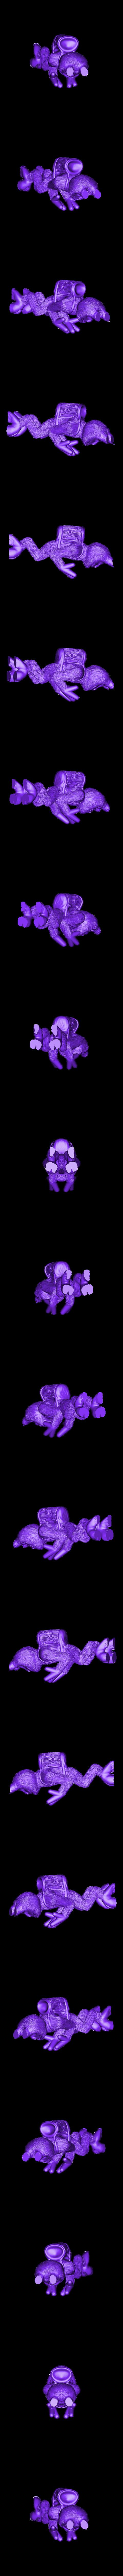 KRAMPUS.stl Download free STL file Gruß vom Krampus • 3D printing object, yourwildworld